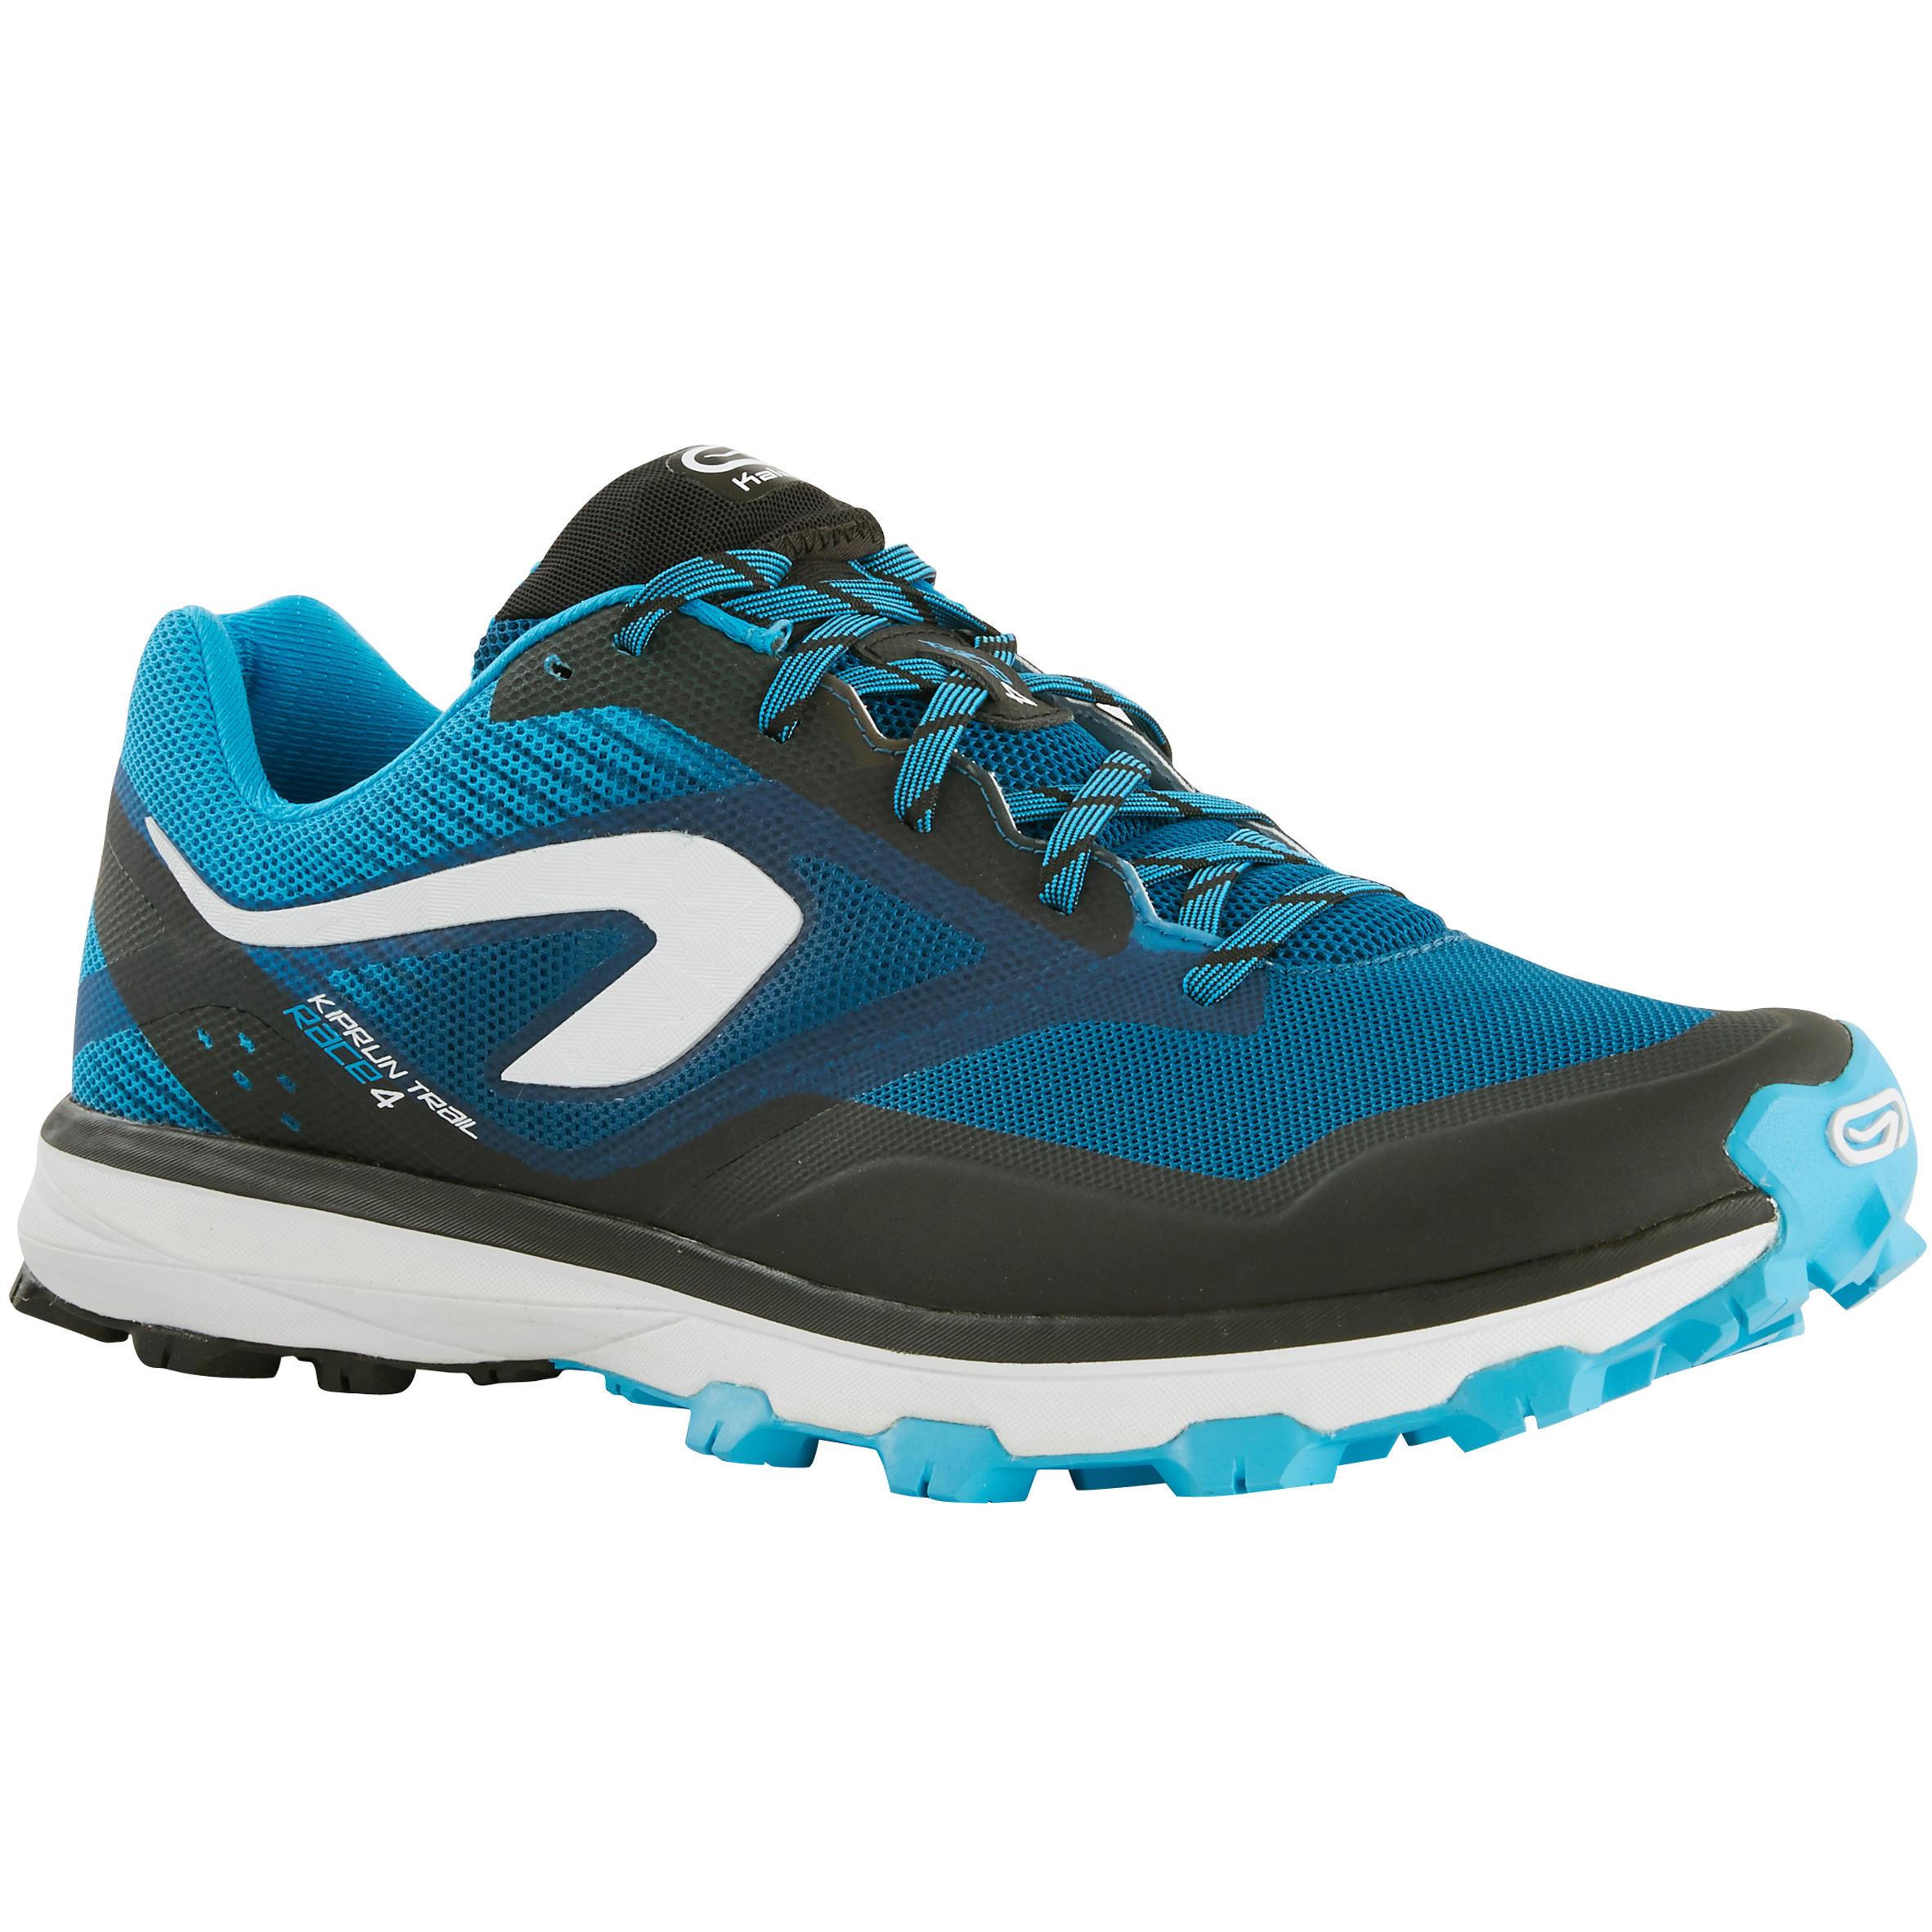 03afa433304 Comprar zapatillas de trail running